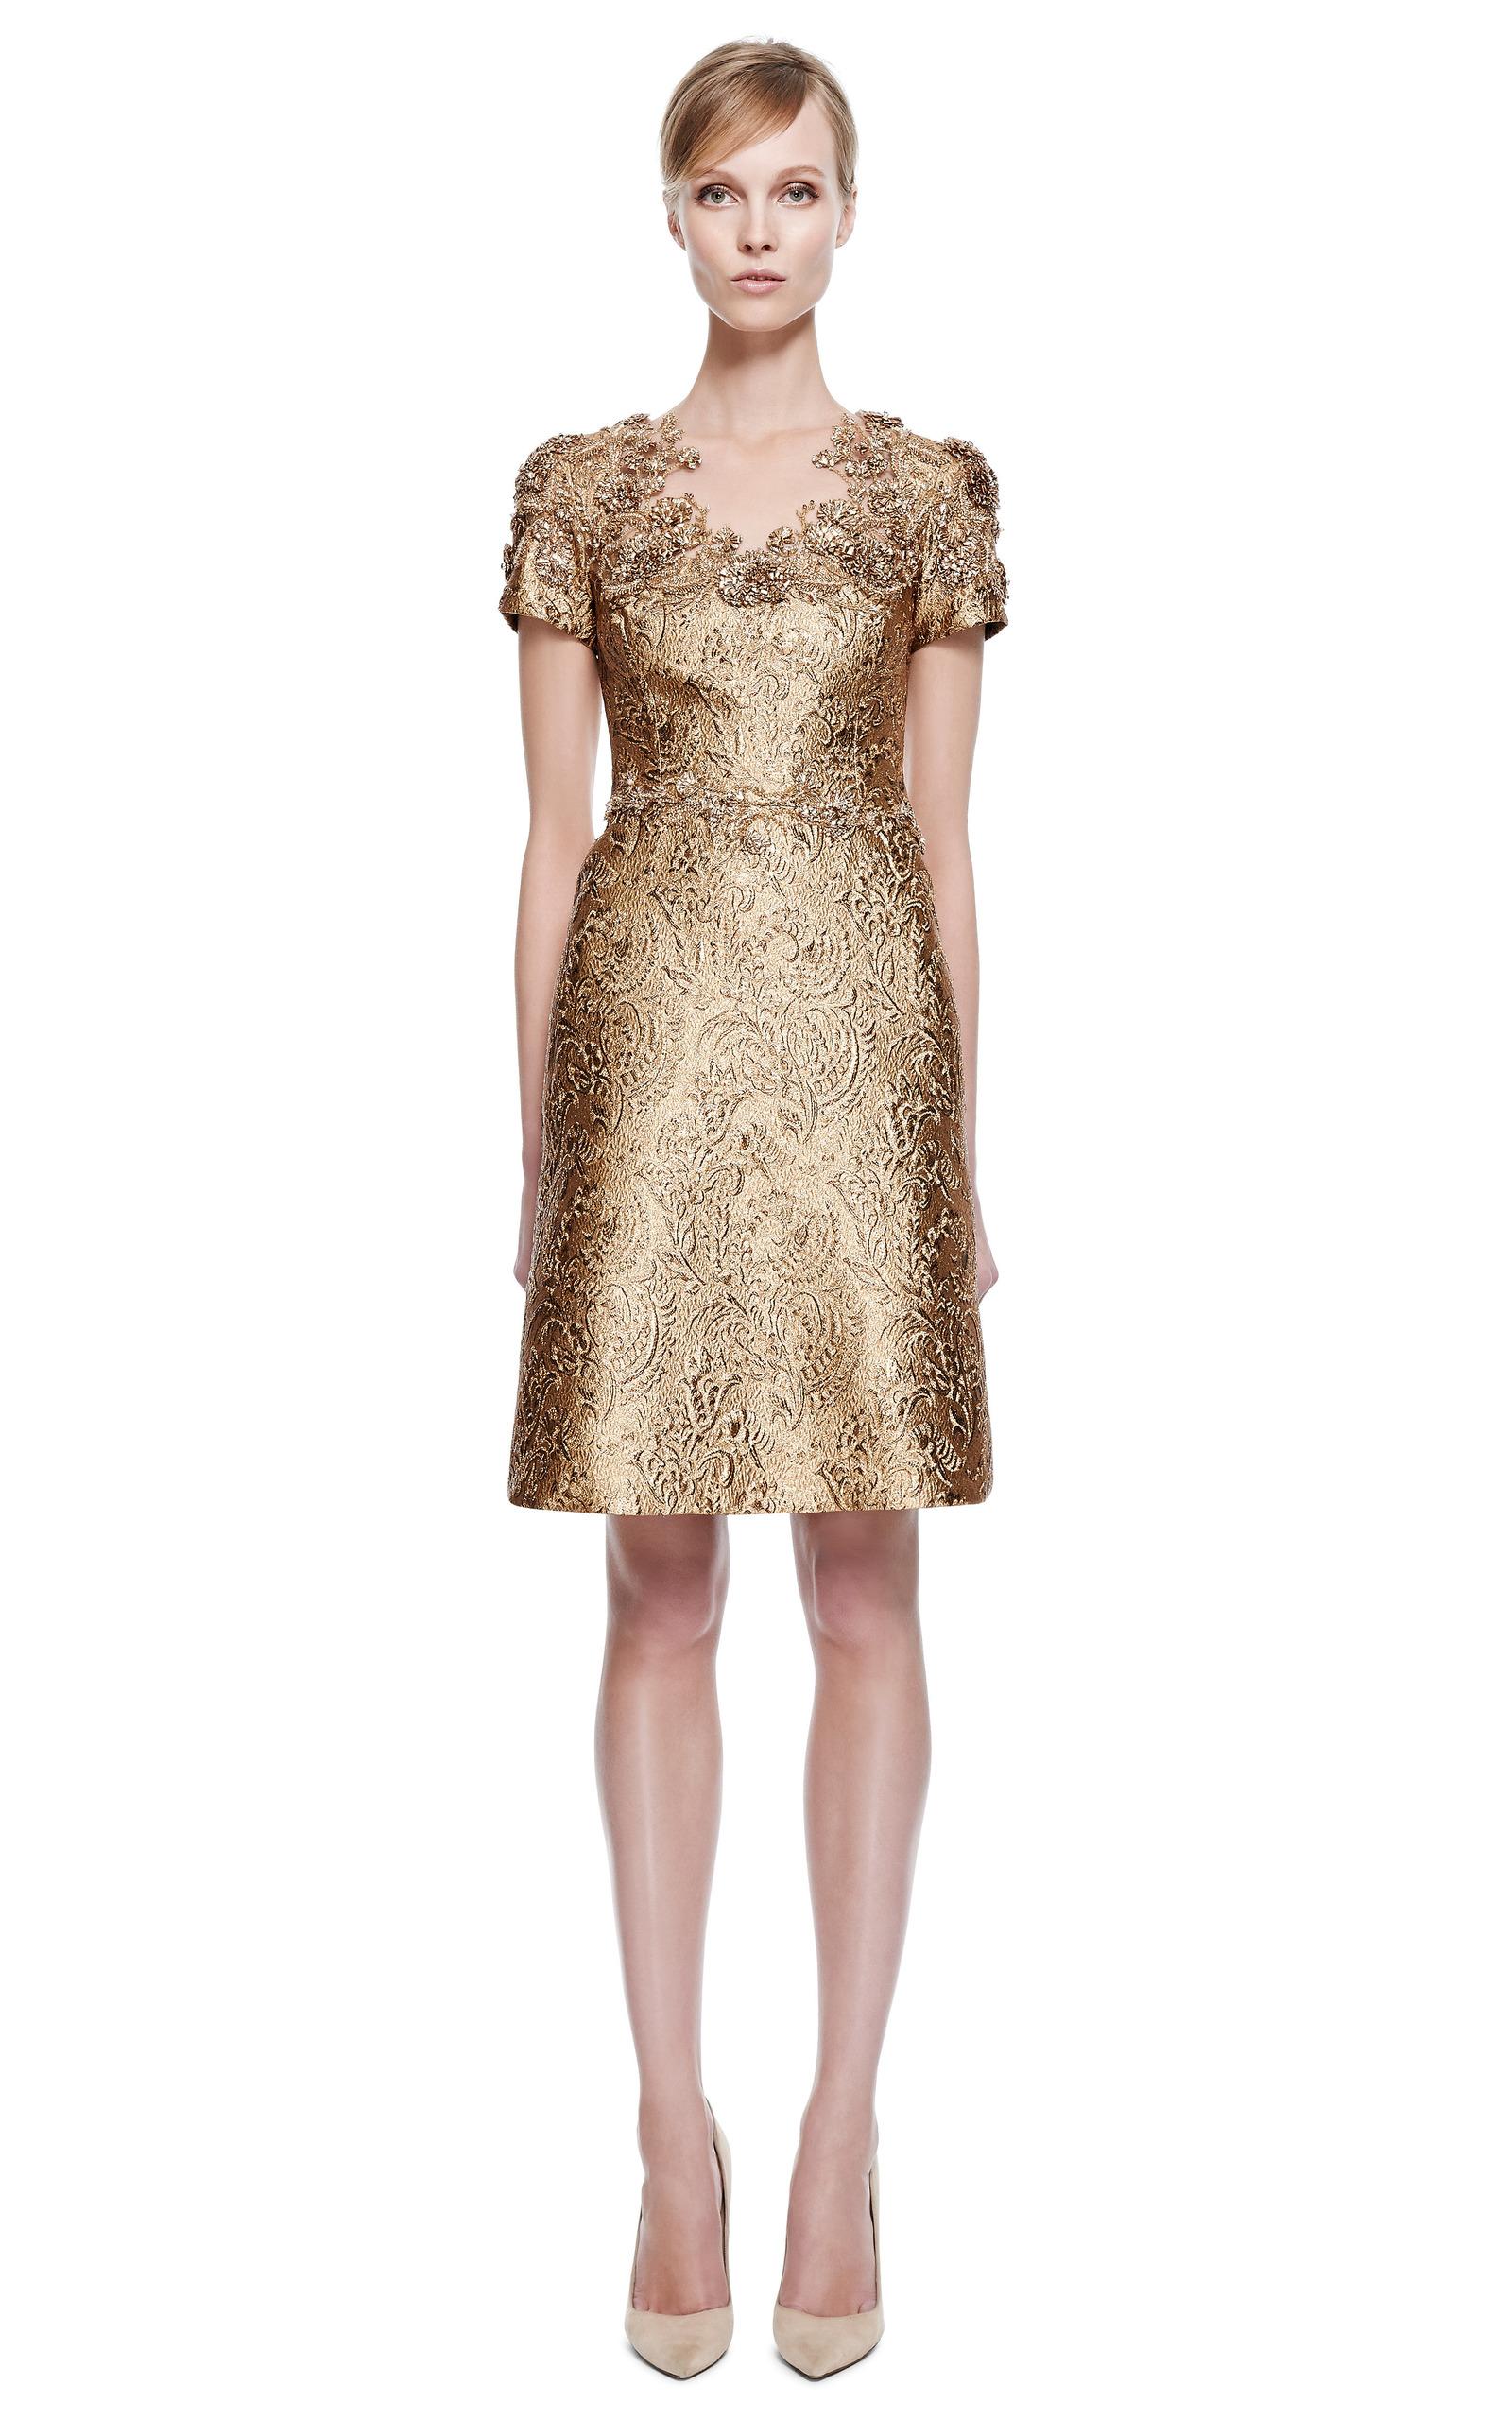 Embroidered Metallic Brocade Cocktail Dress by Marchesa | Moda Operandi